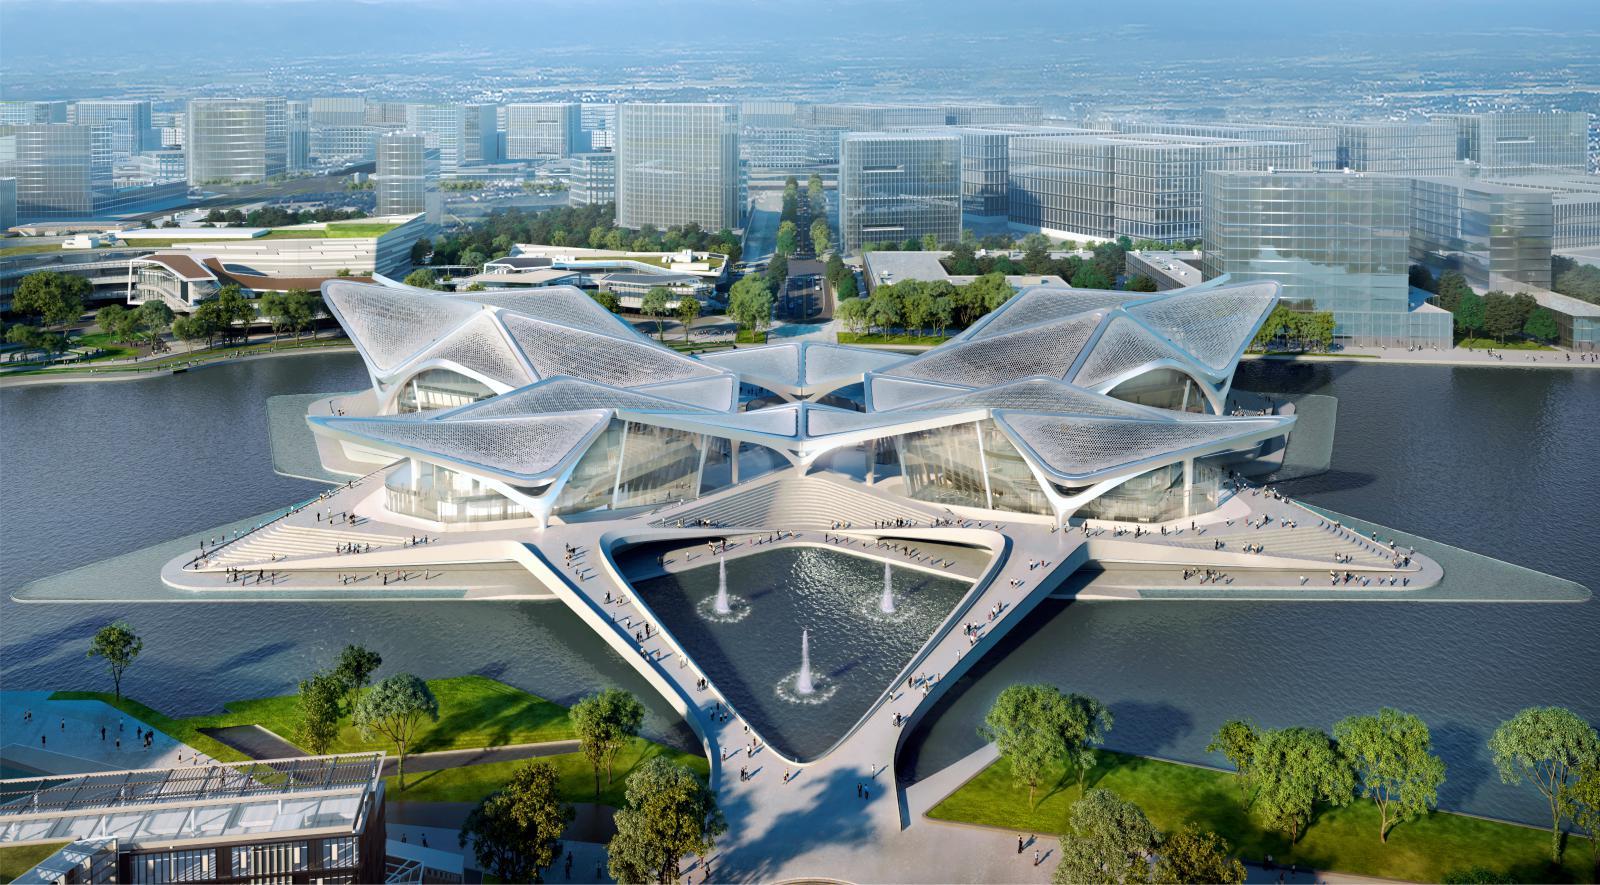 Zhuhai Jinwan Civic Art Centre